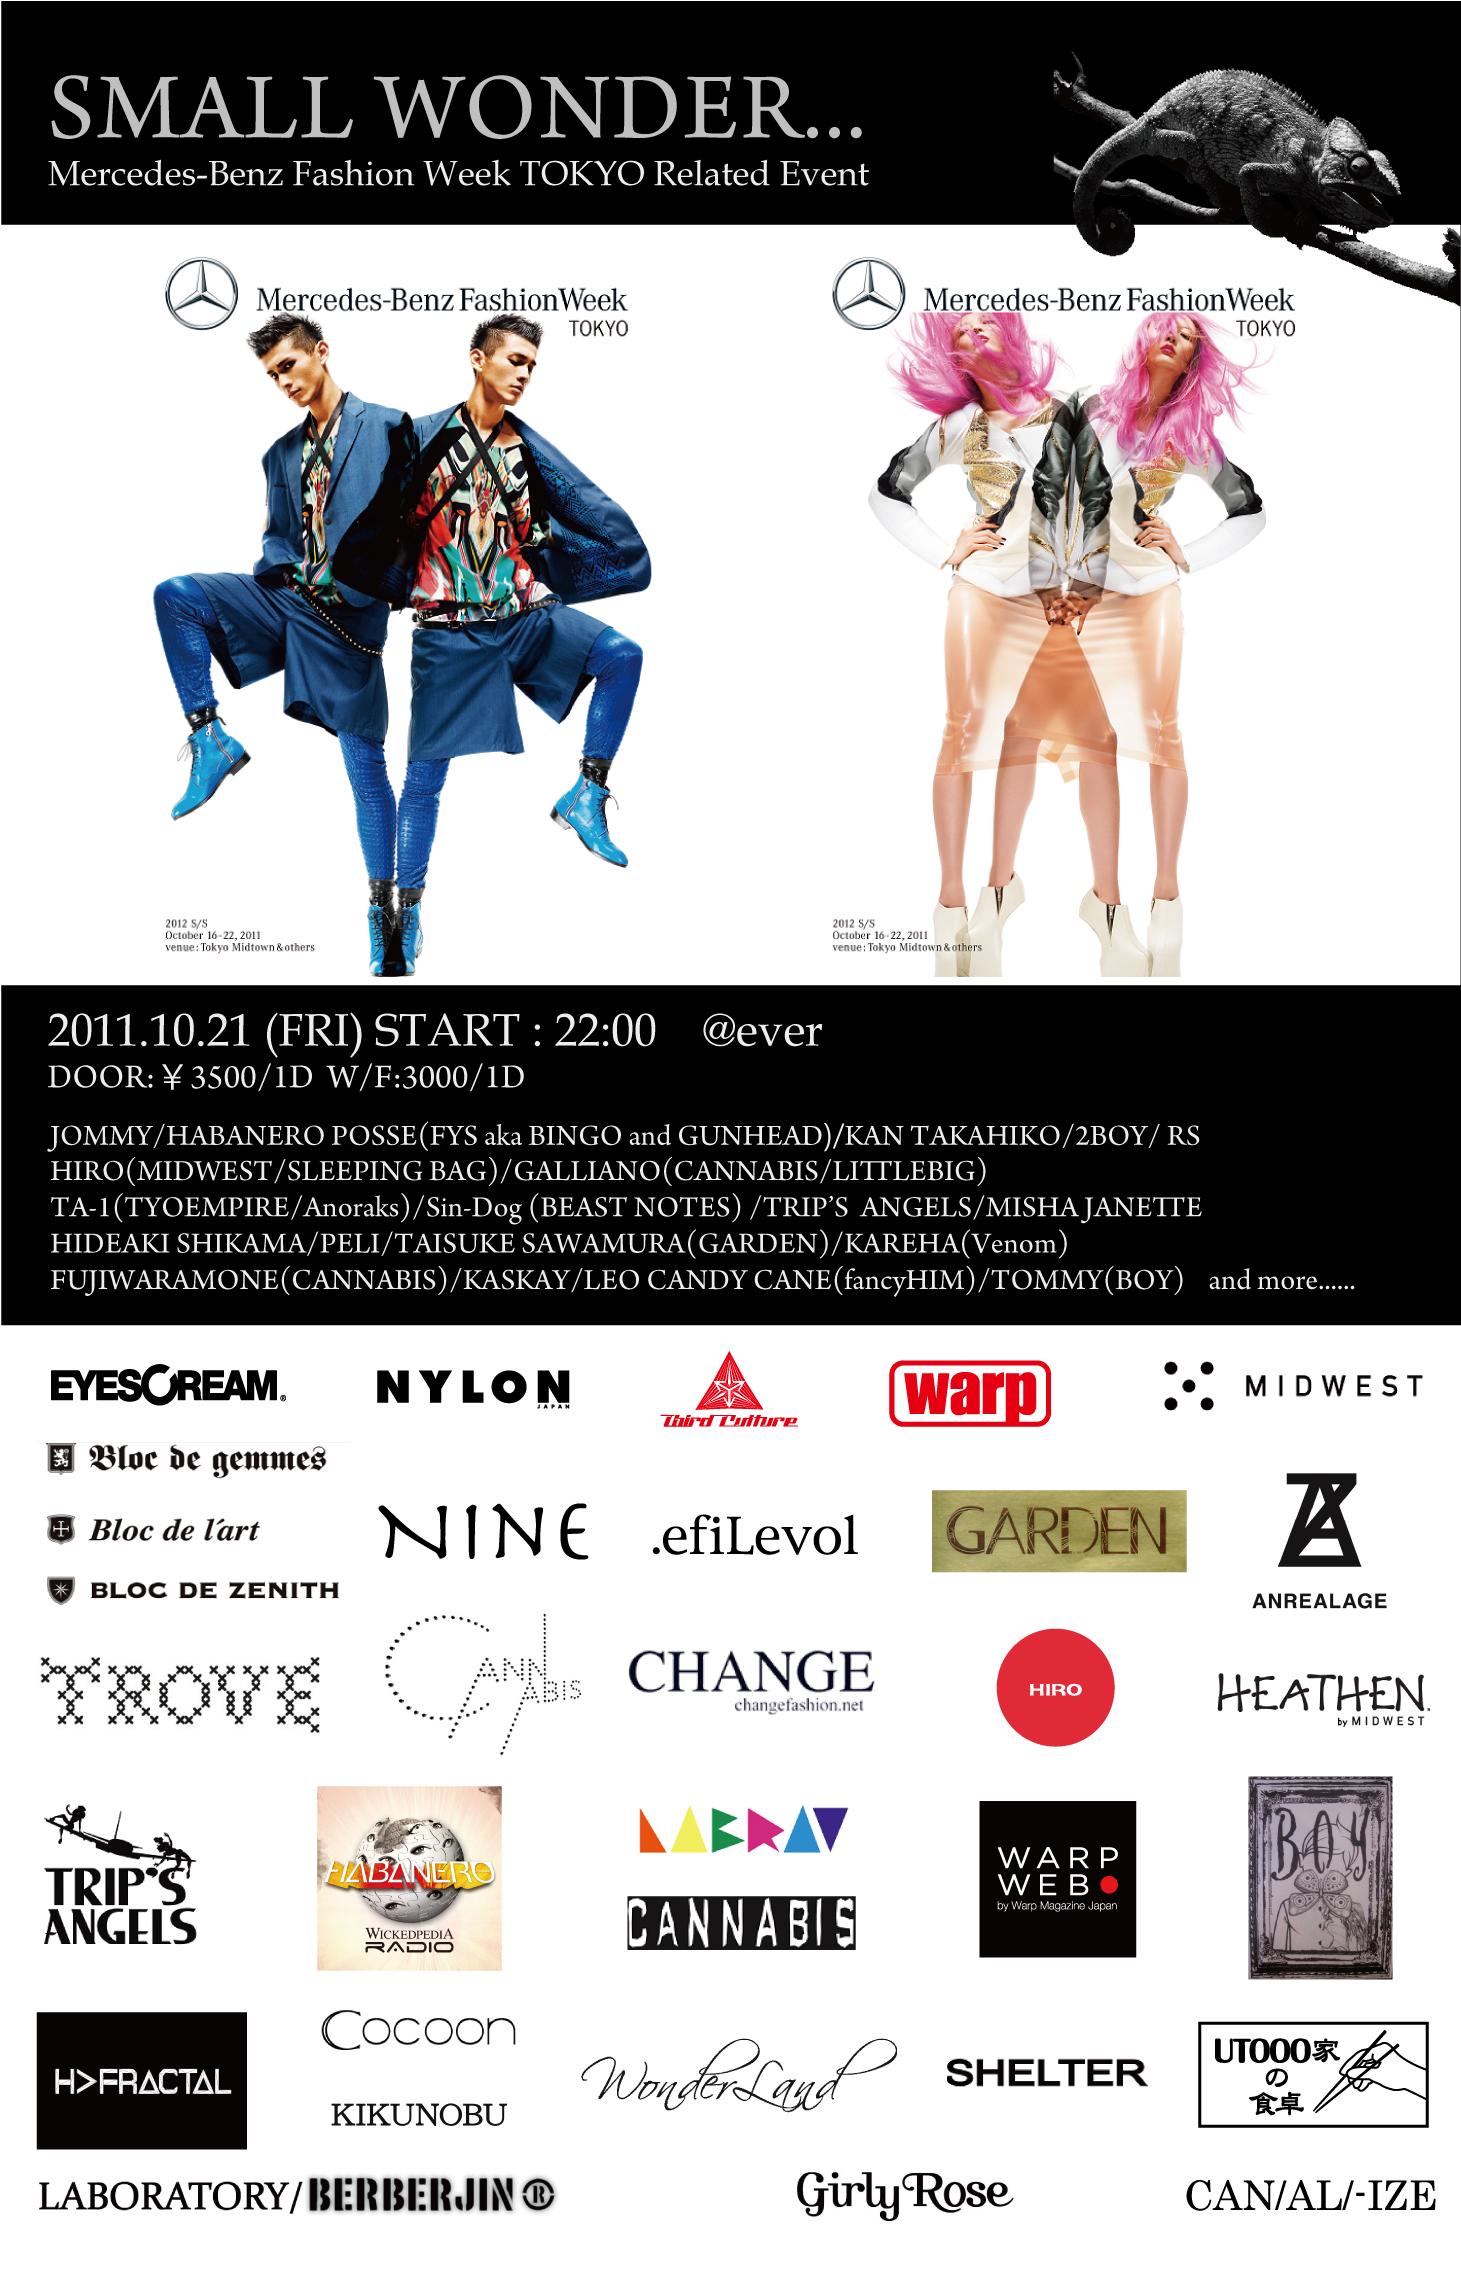 """『SMALL WONDER(スモールワンダー)』が  『Mercedes-Benz Fashion Week TOKYO RELATED Event』  としてファッションウィークの週末10月21日(金)に『青山ever』にて開催が決定!"""